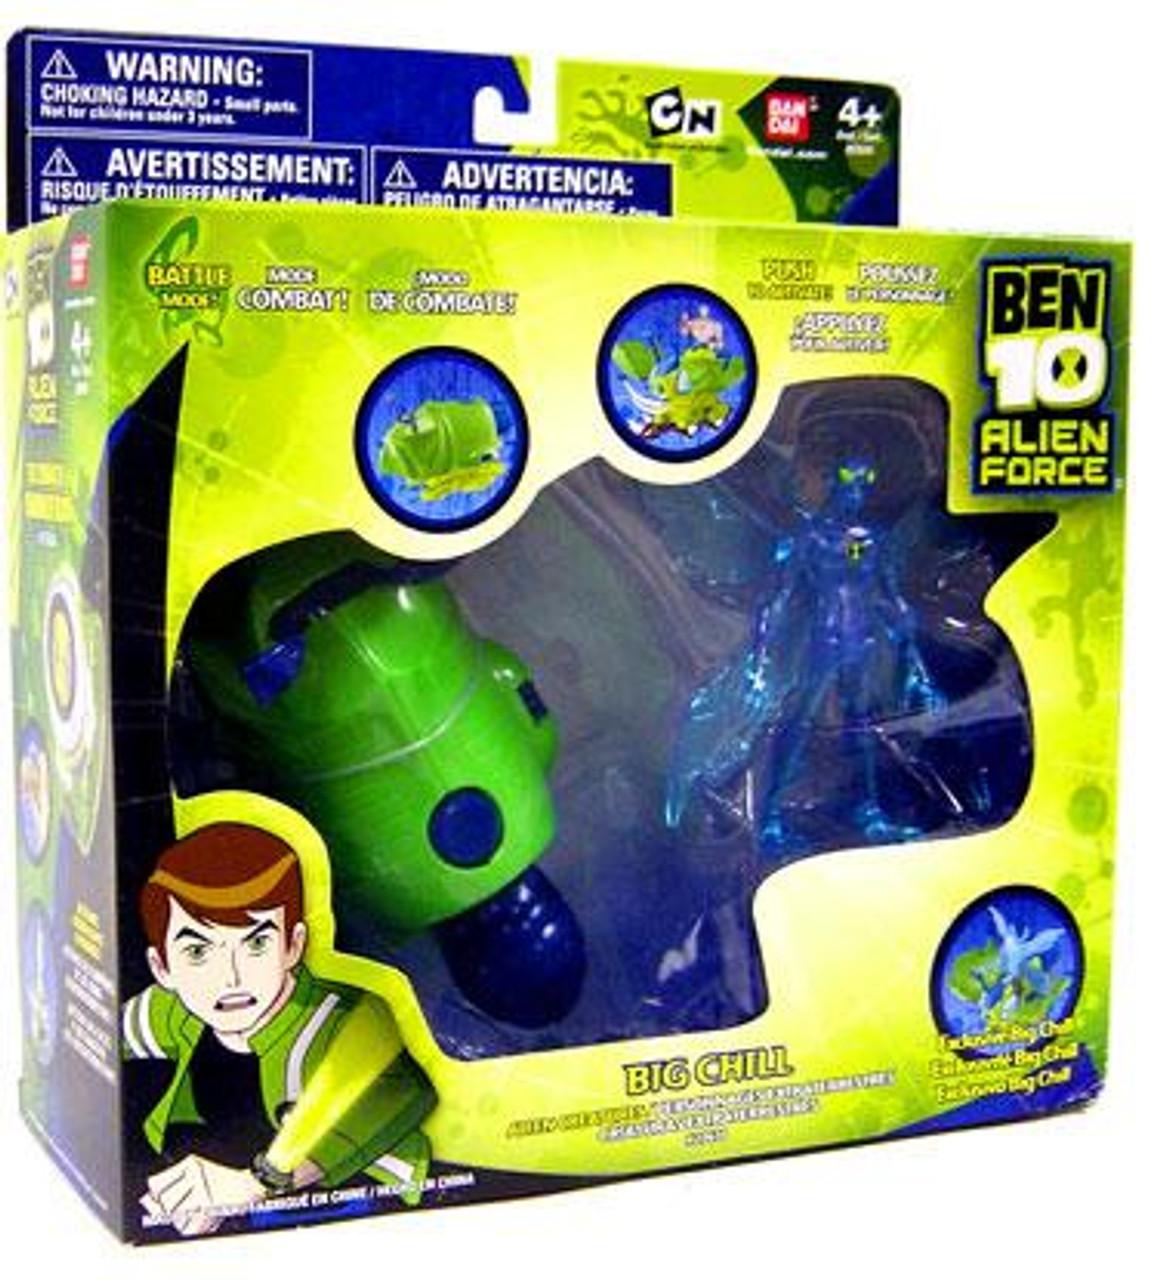 Ben 10 Alien Force Alien Creatures Big Chill Action Figure Set [Clear]